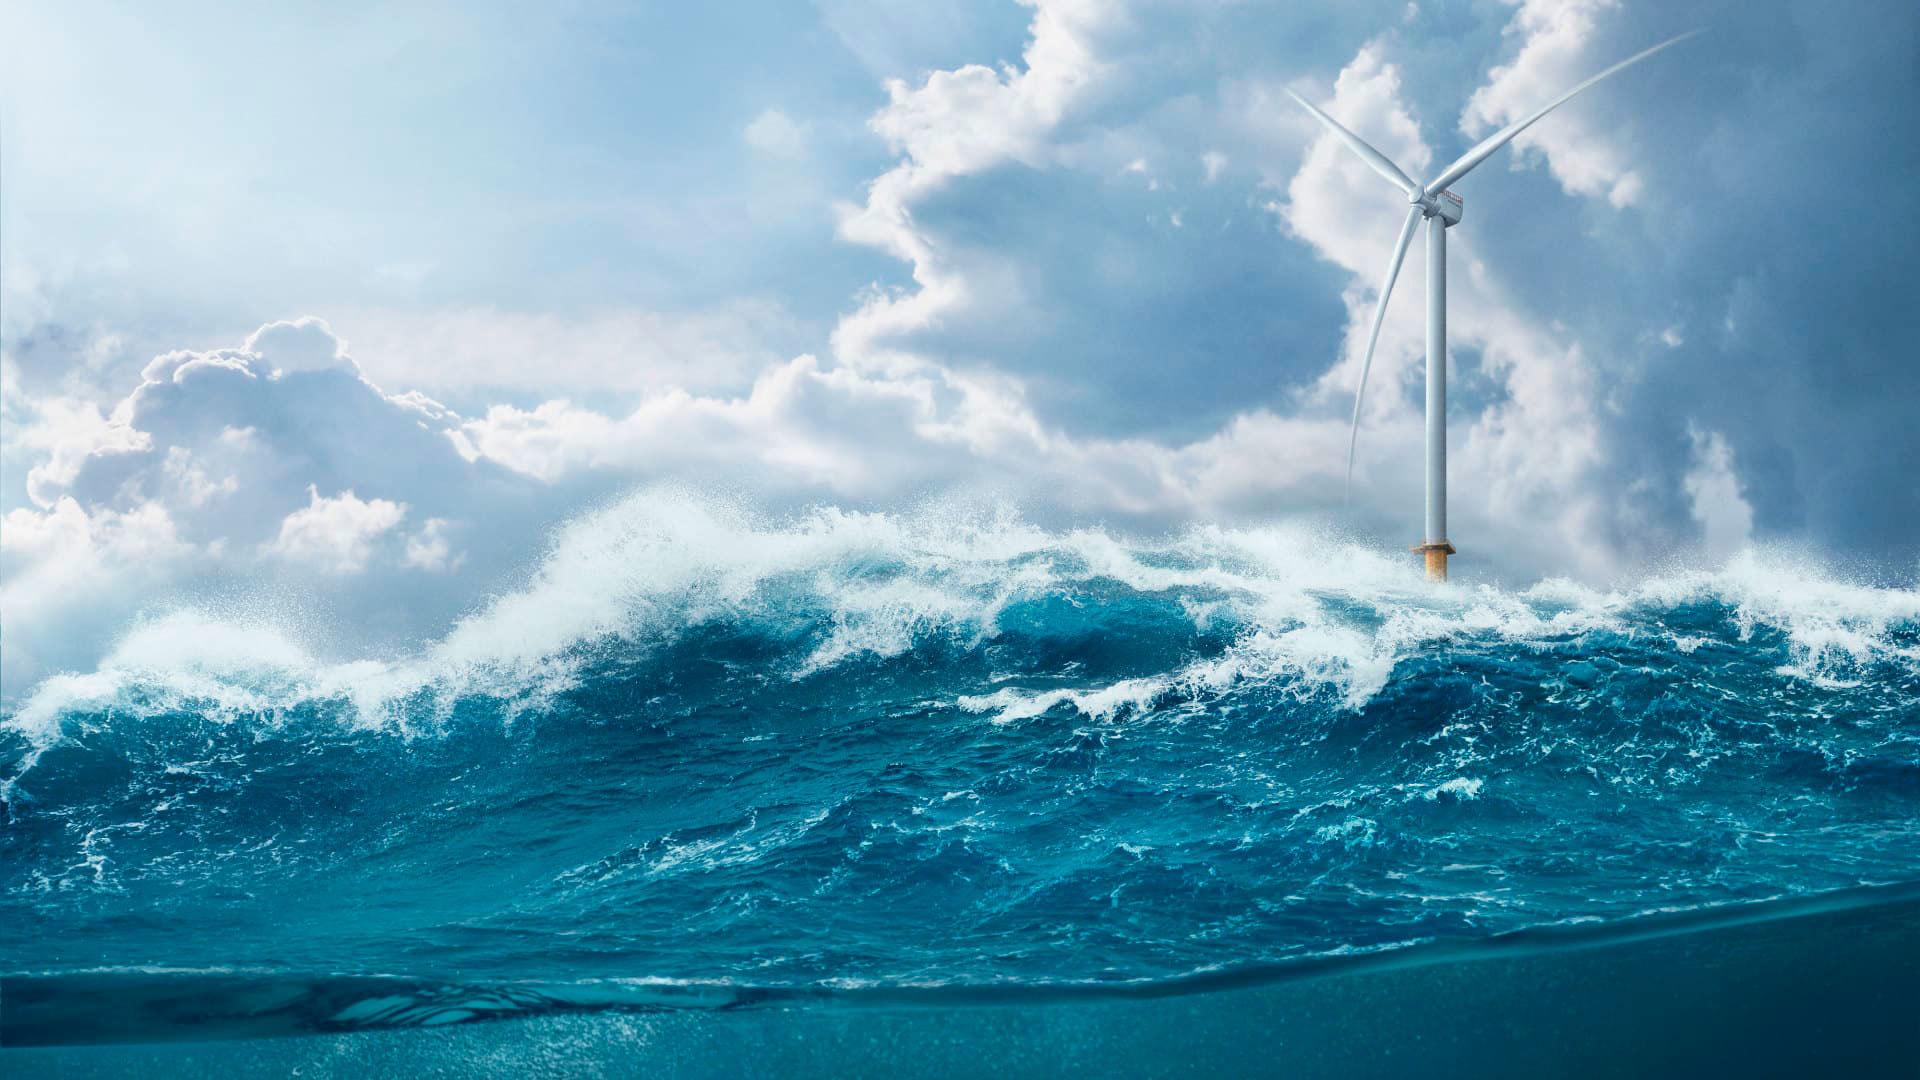 Energia Eolica Siemens Gamesa Olas Mar Combustible